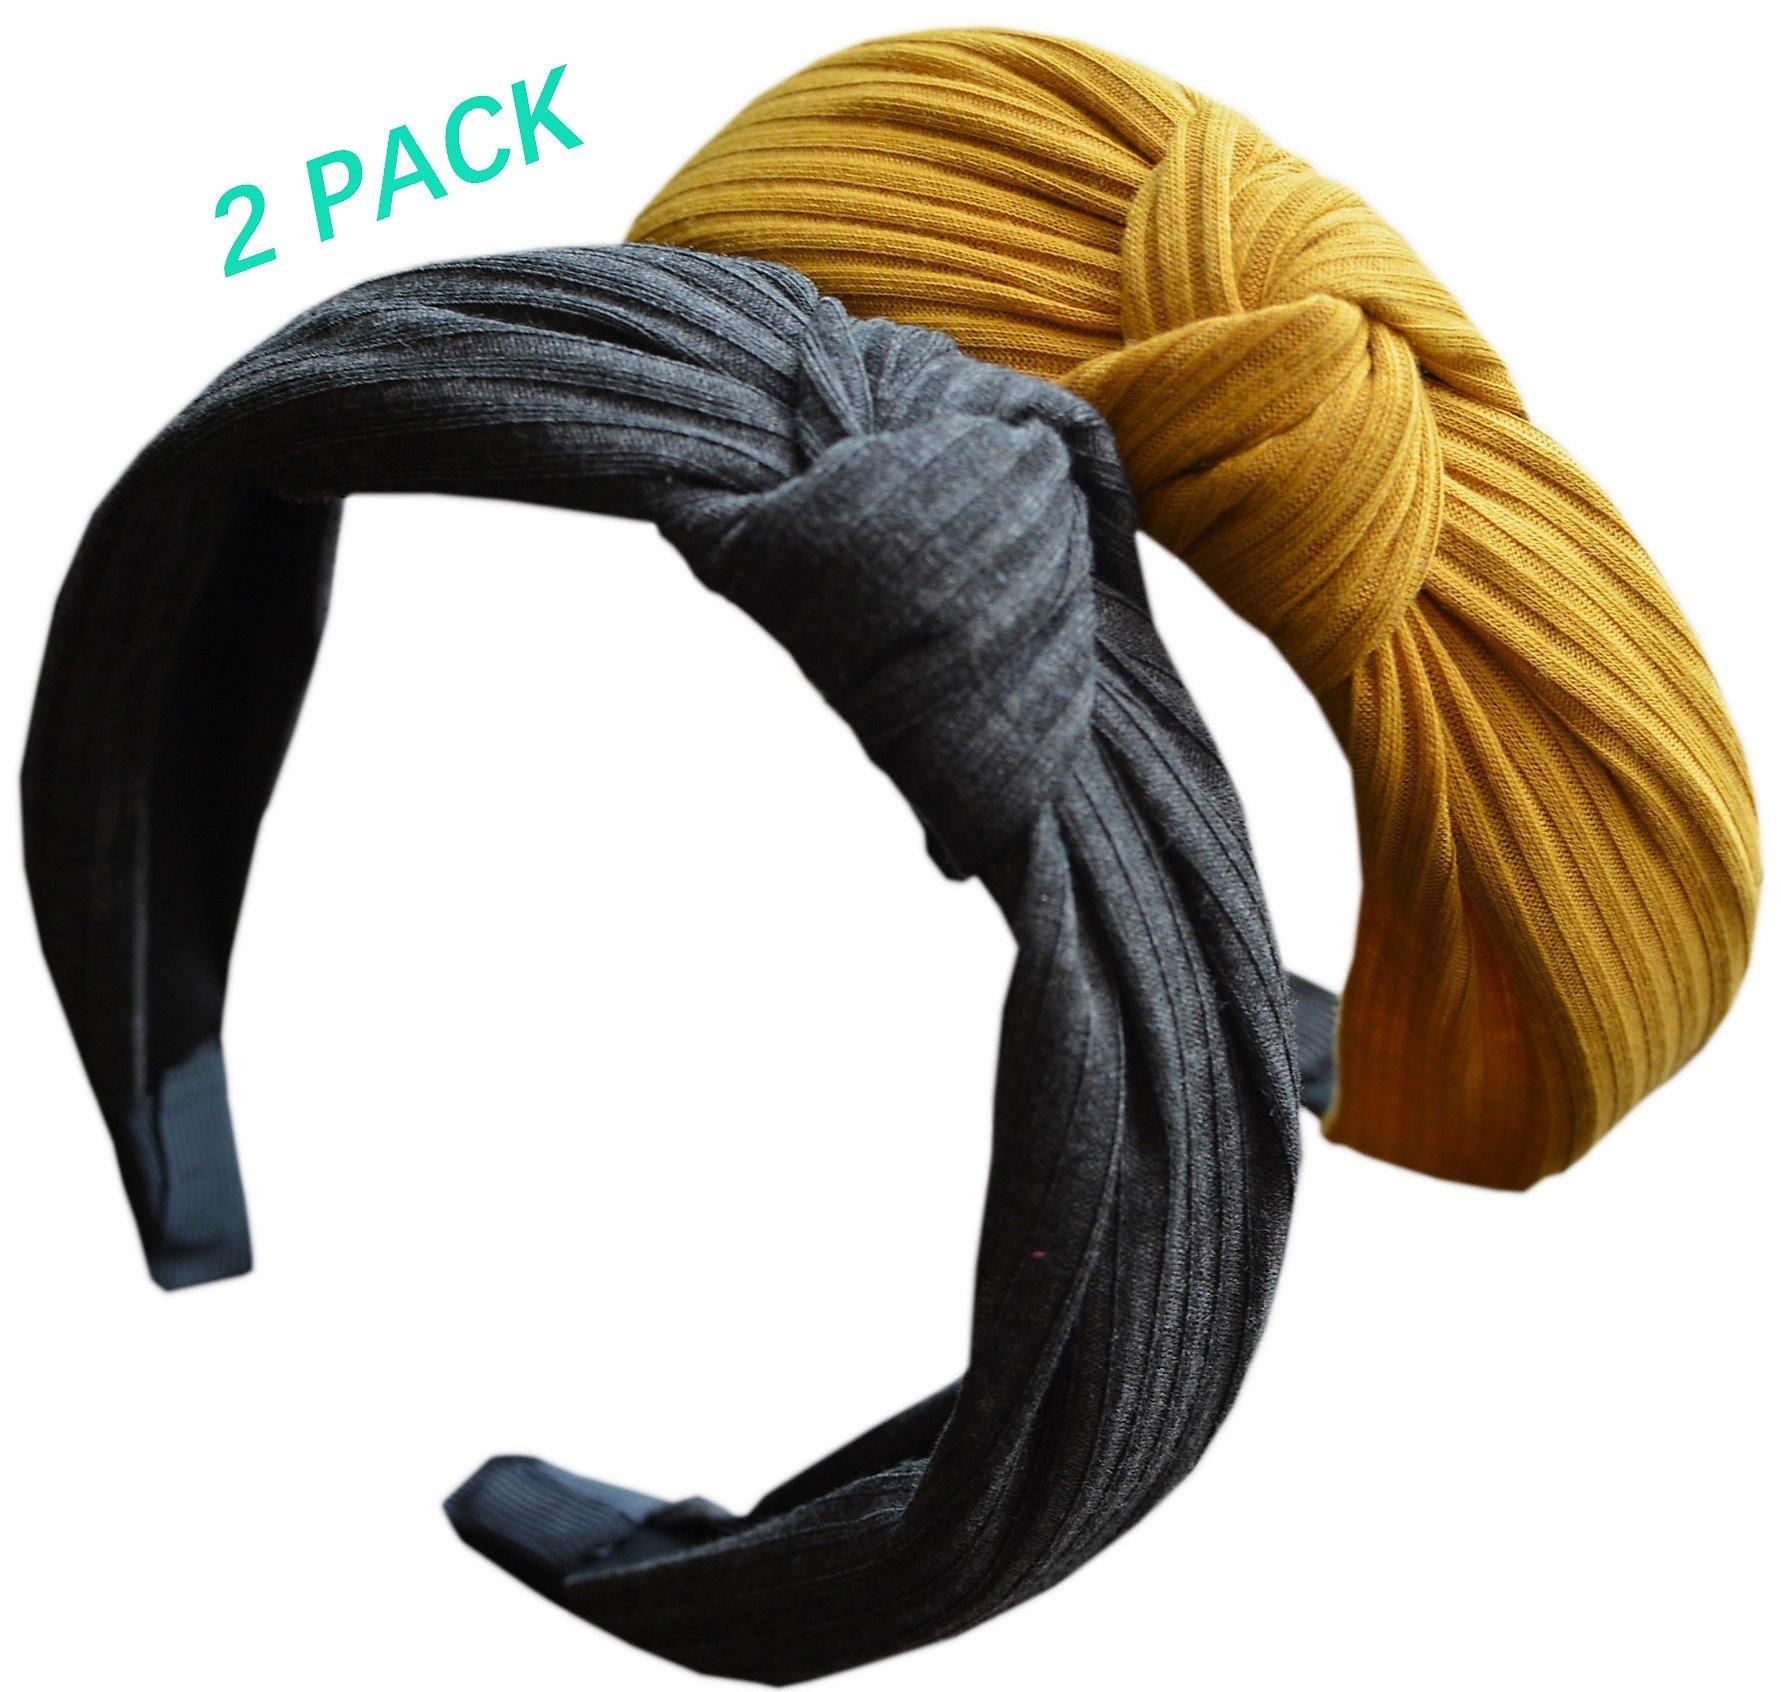 ZaoProteks ZP3302 Wide Plain Fashion Headbands Knot Turban Headband for Girls and Women